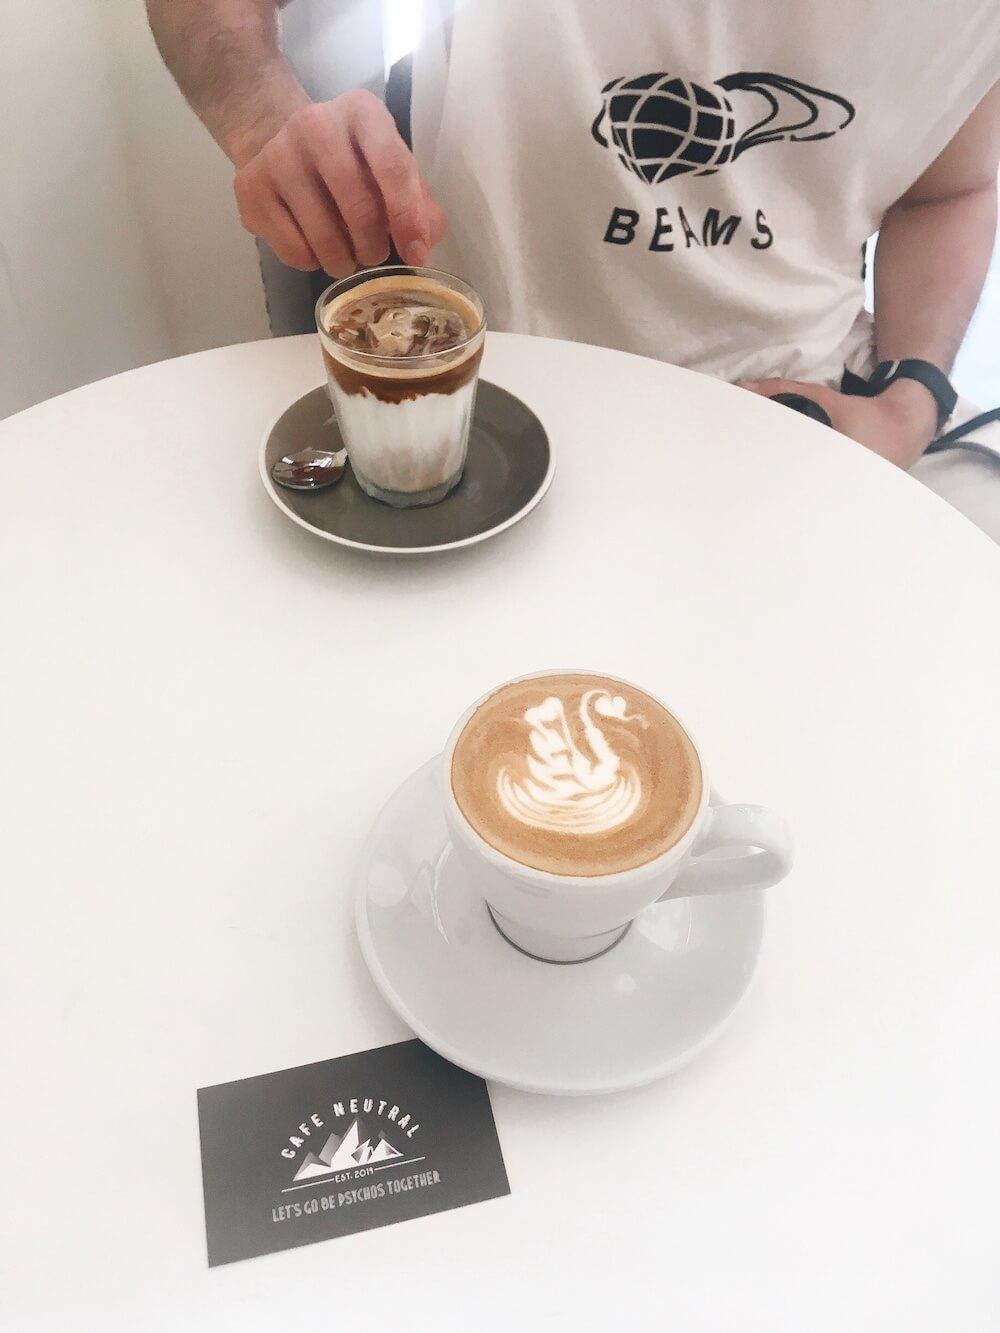 CAFE NEURAL